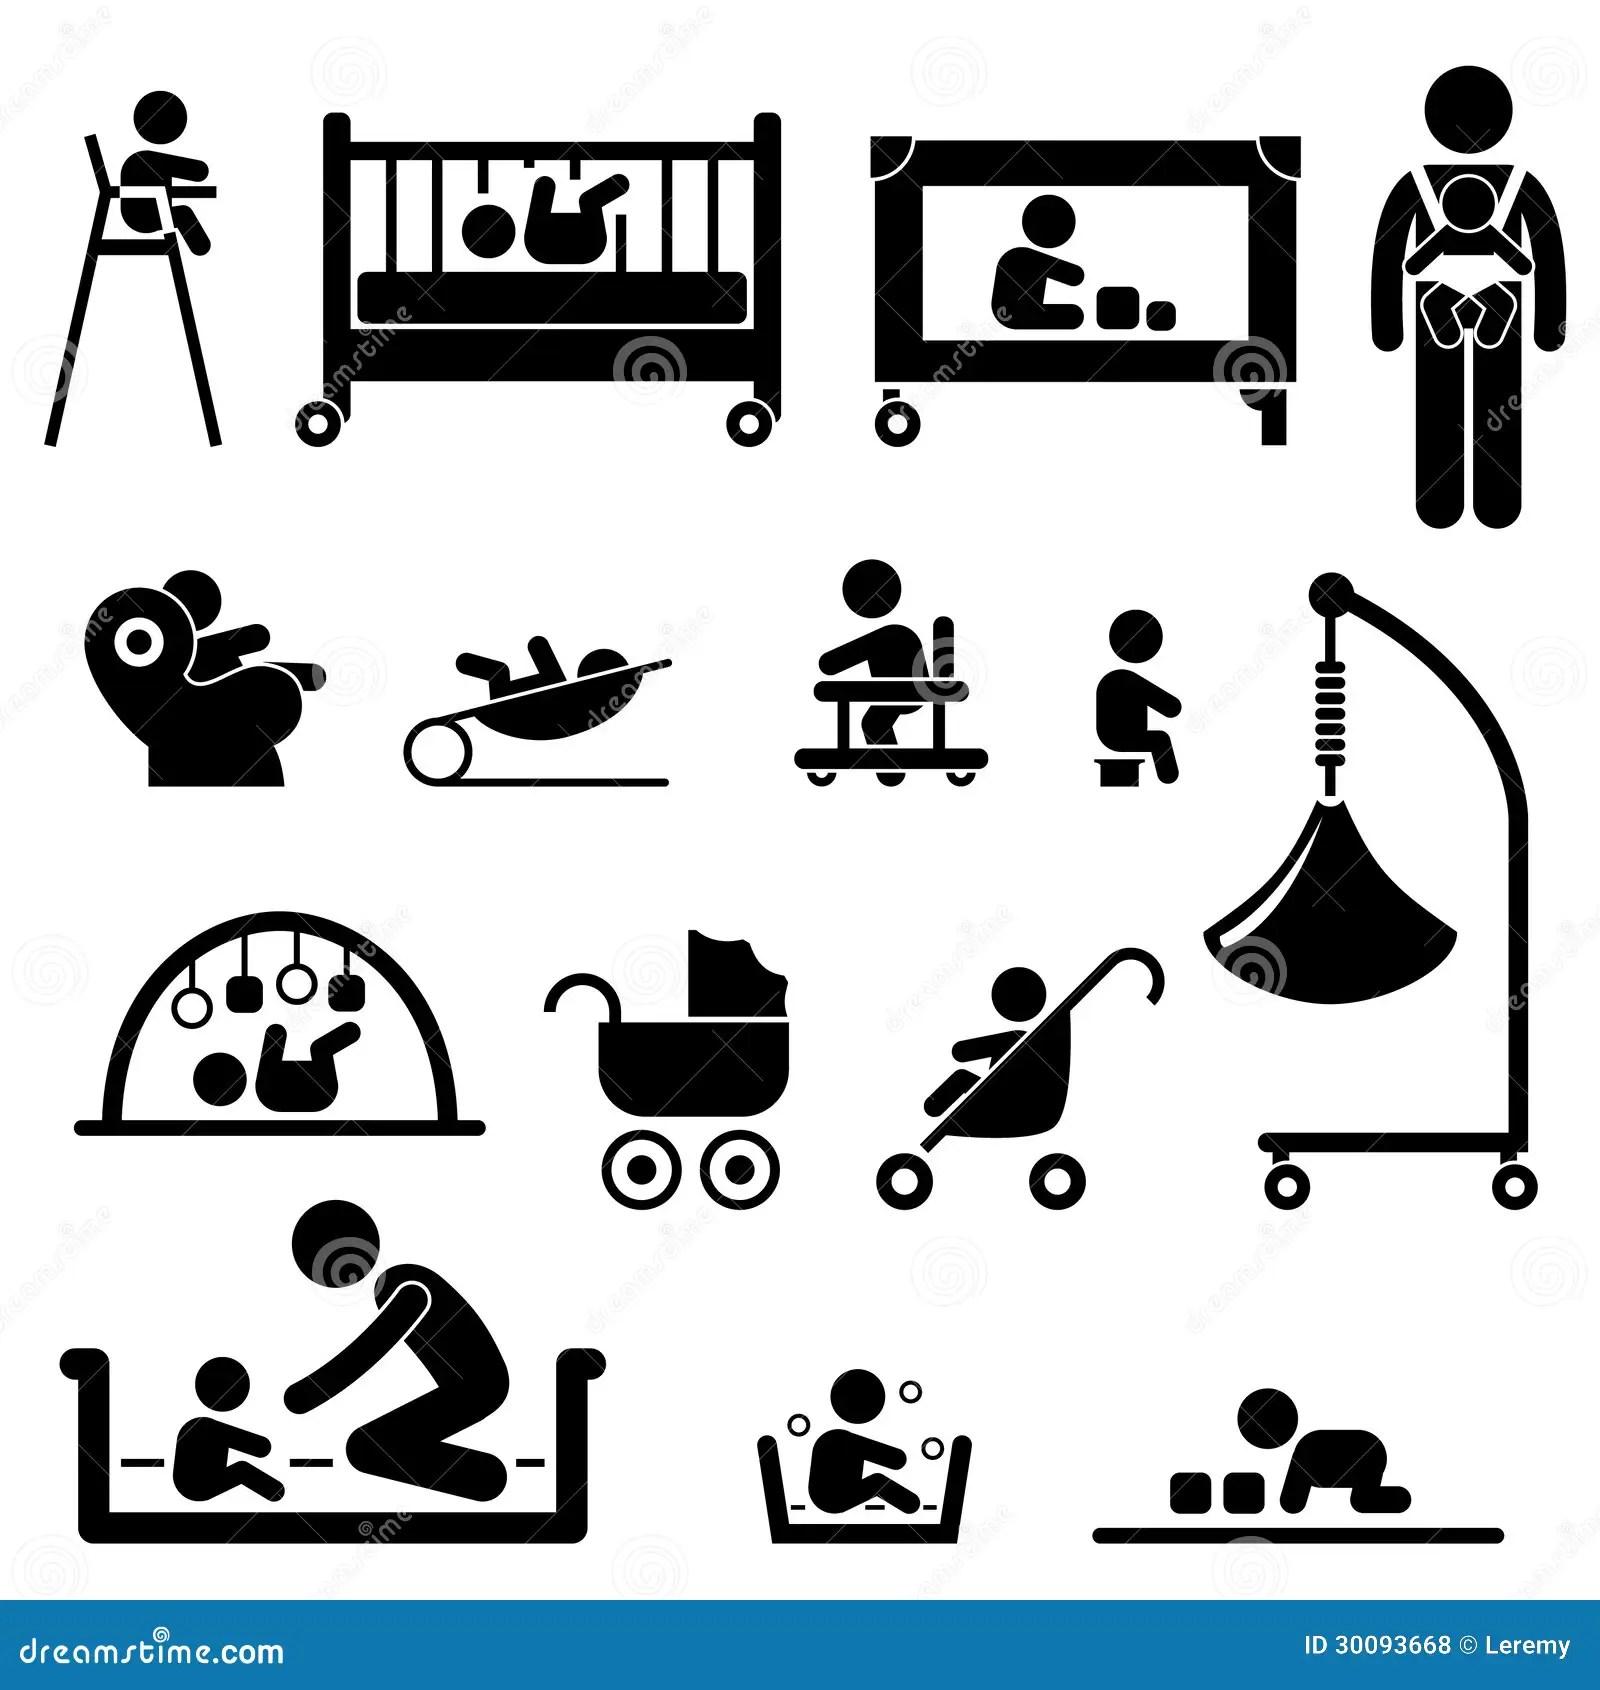 Baby Child Newborn Toddler Kid Equipment Pictogram Royalty